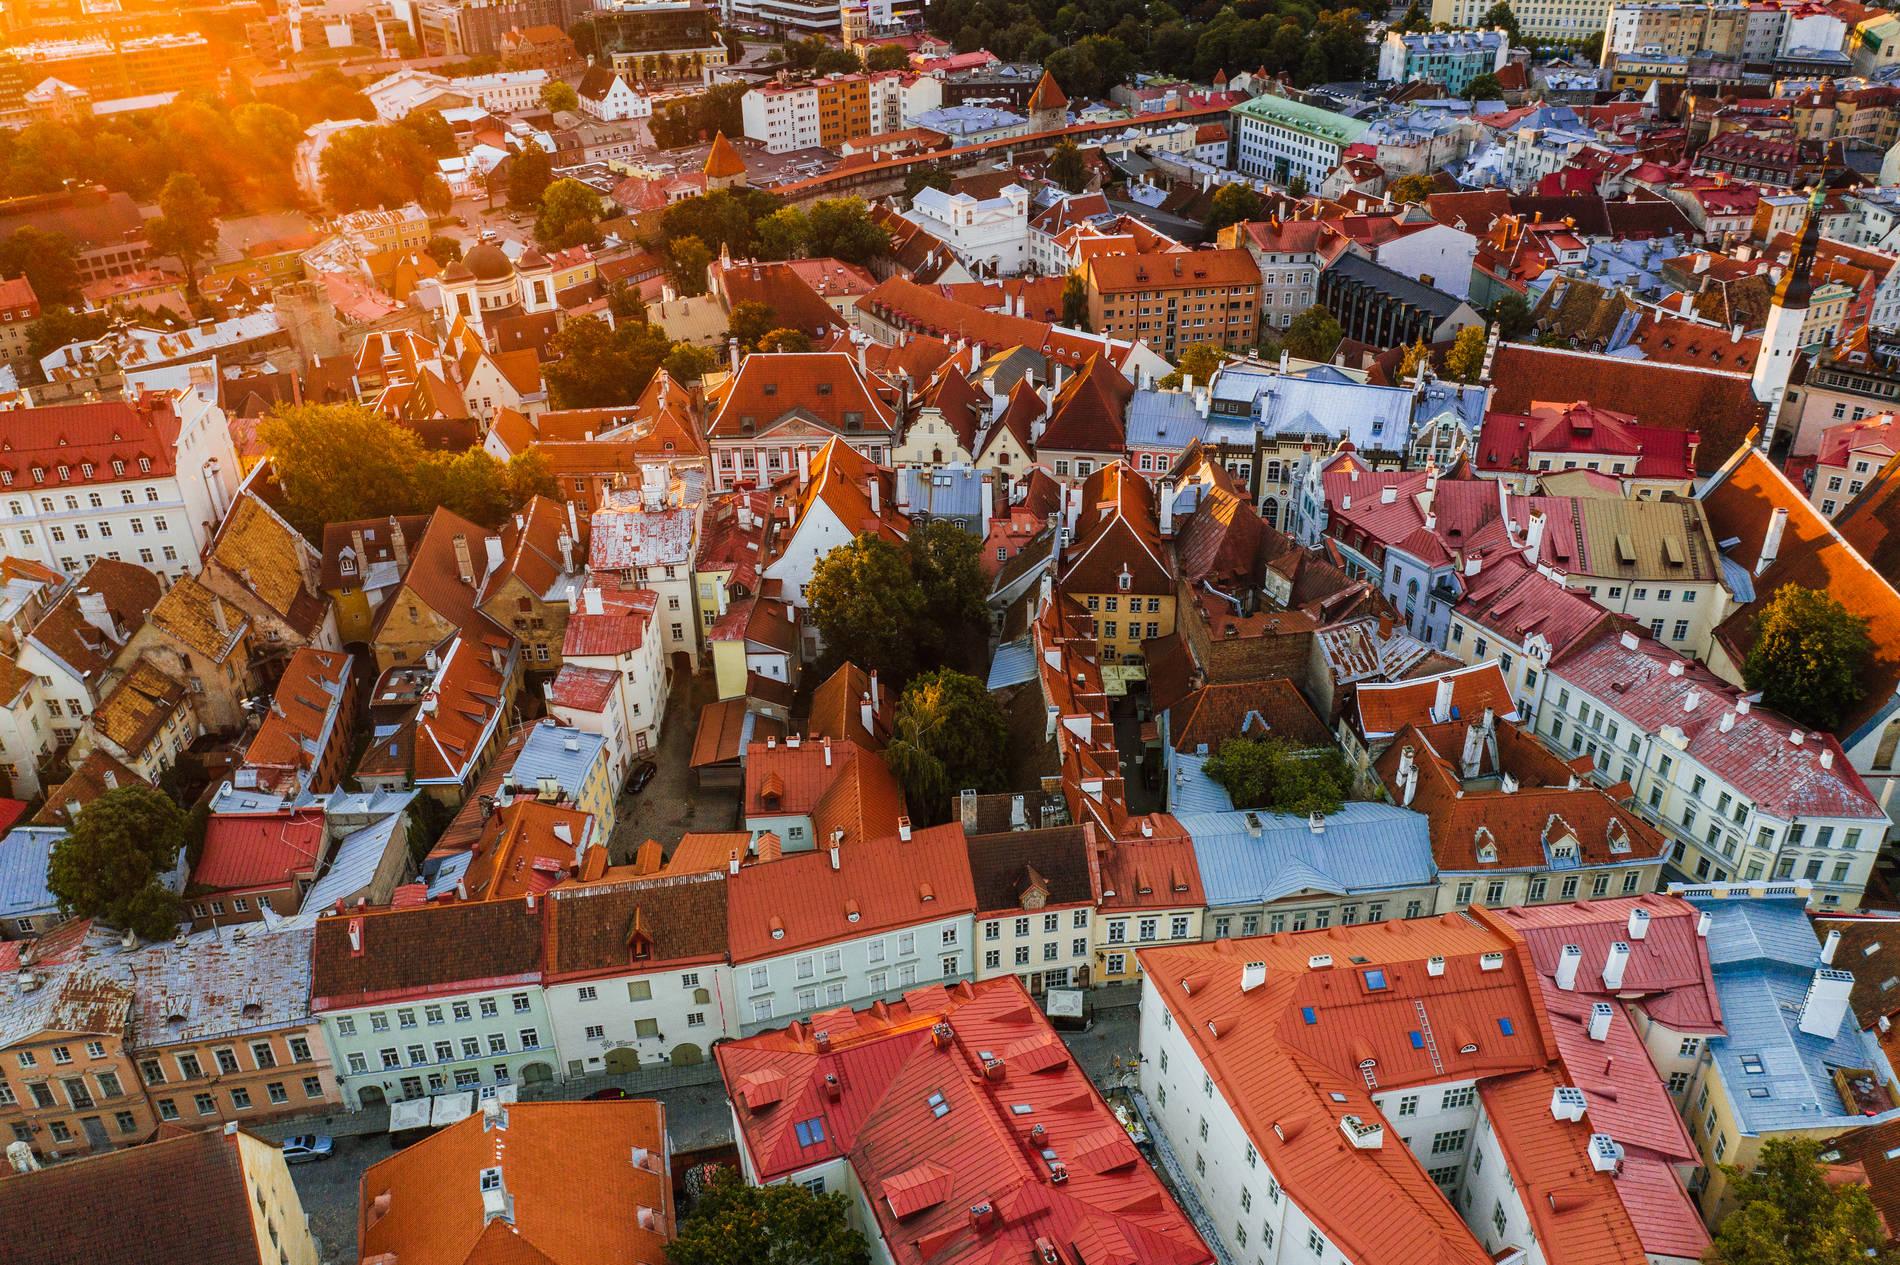 View of the Old Town in Tallinn, Estonia